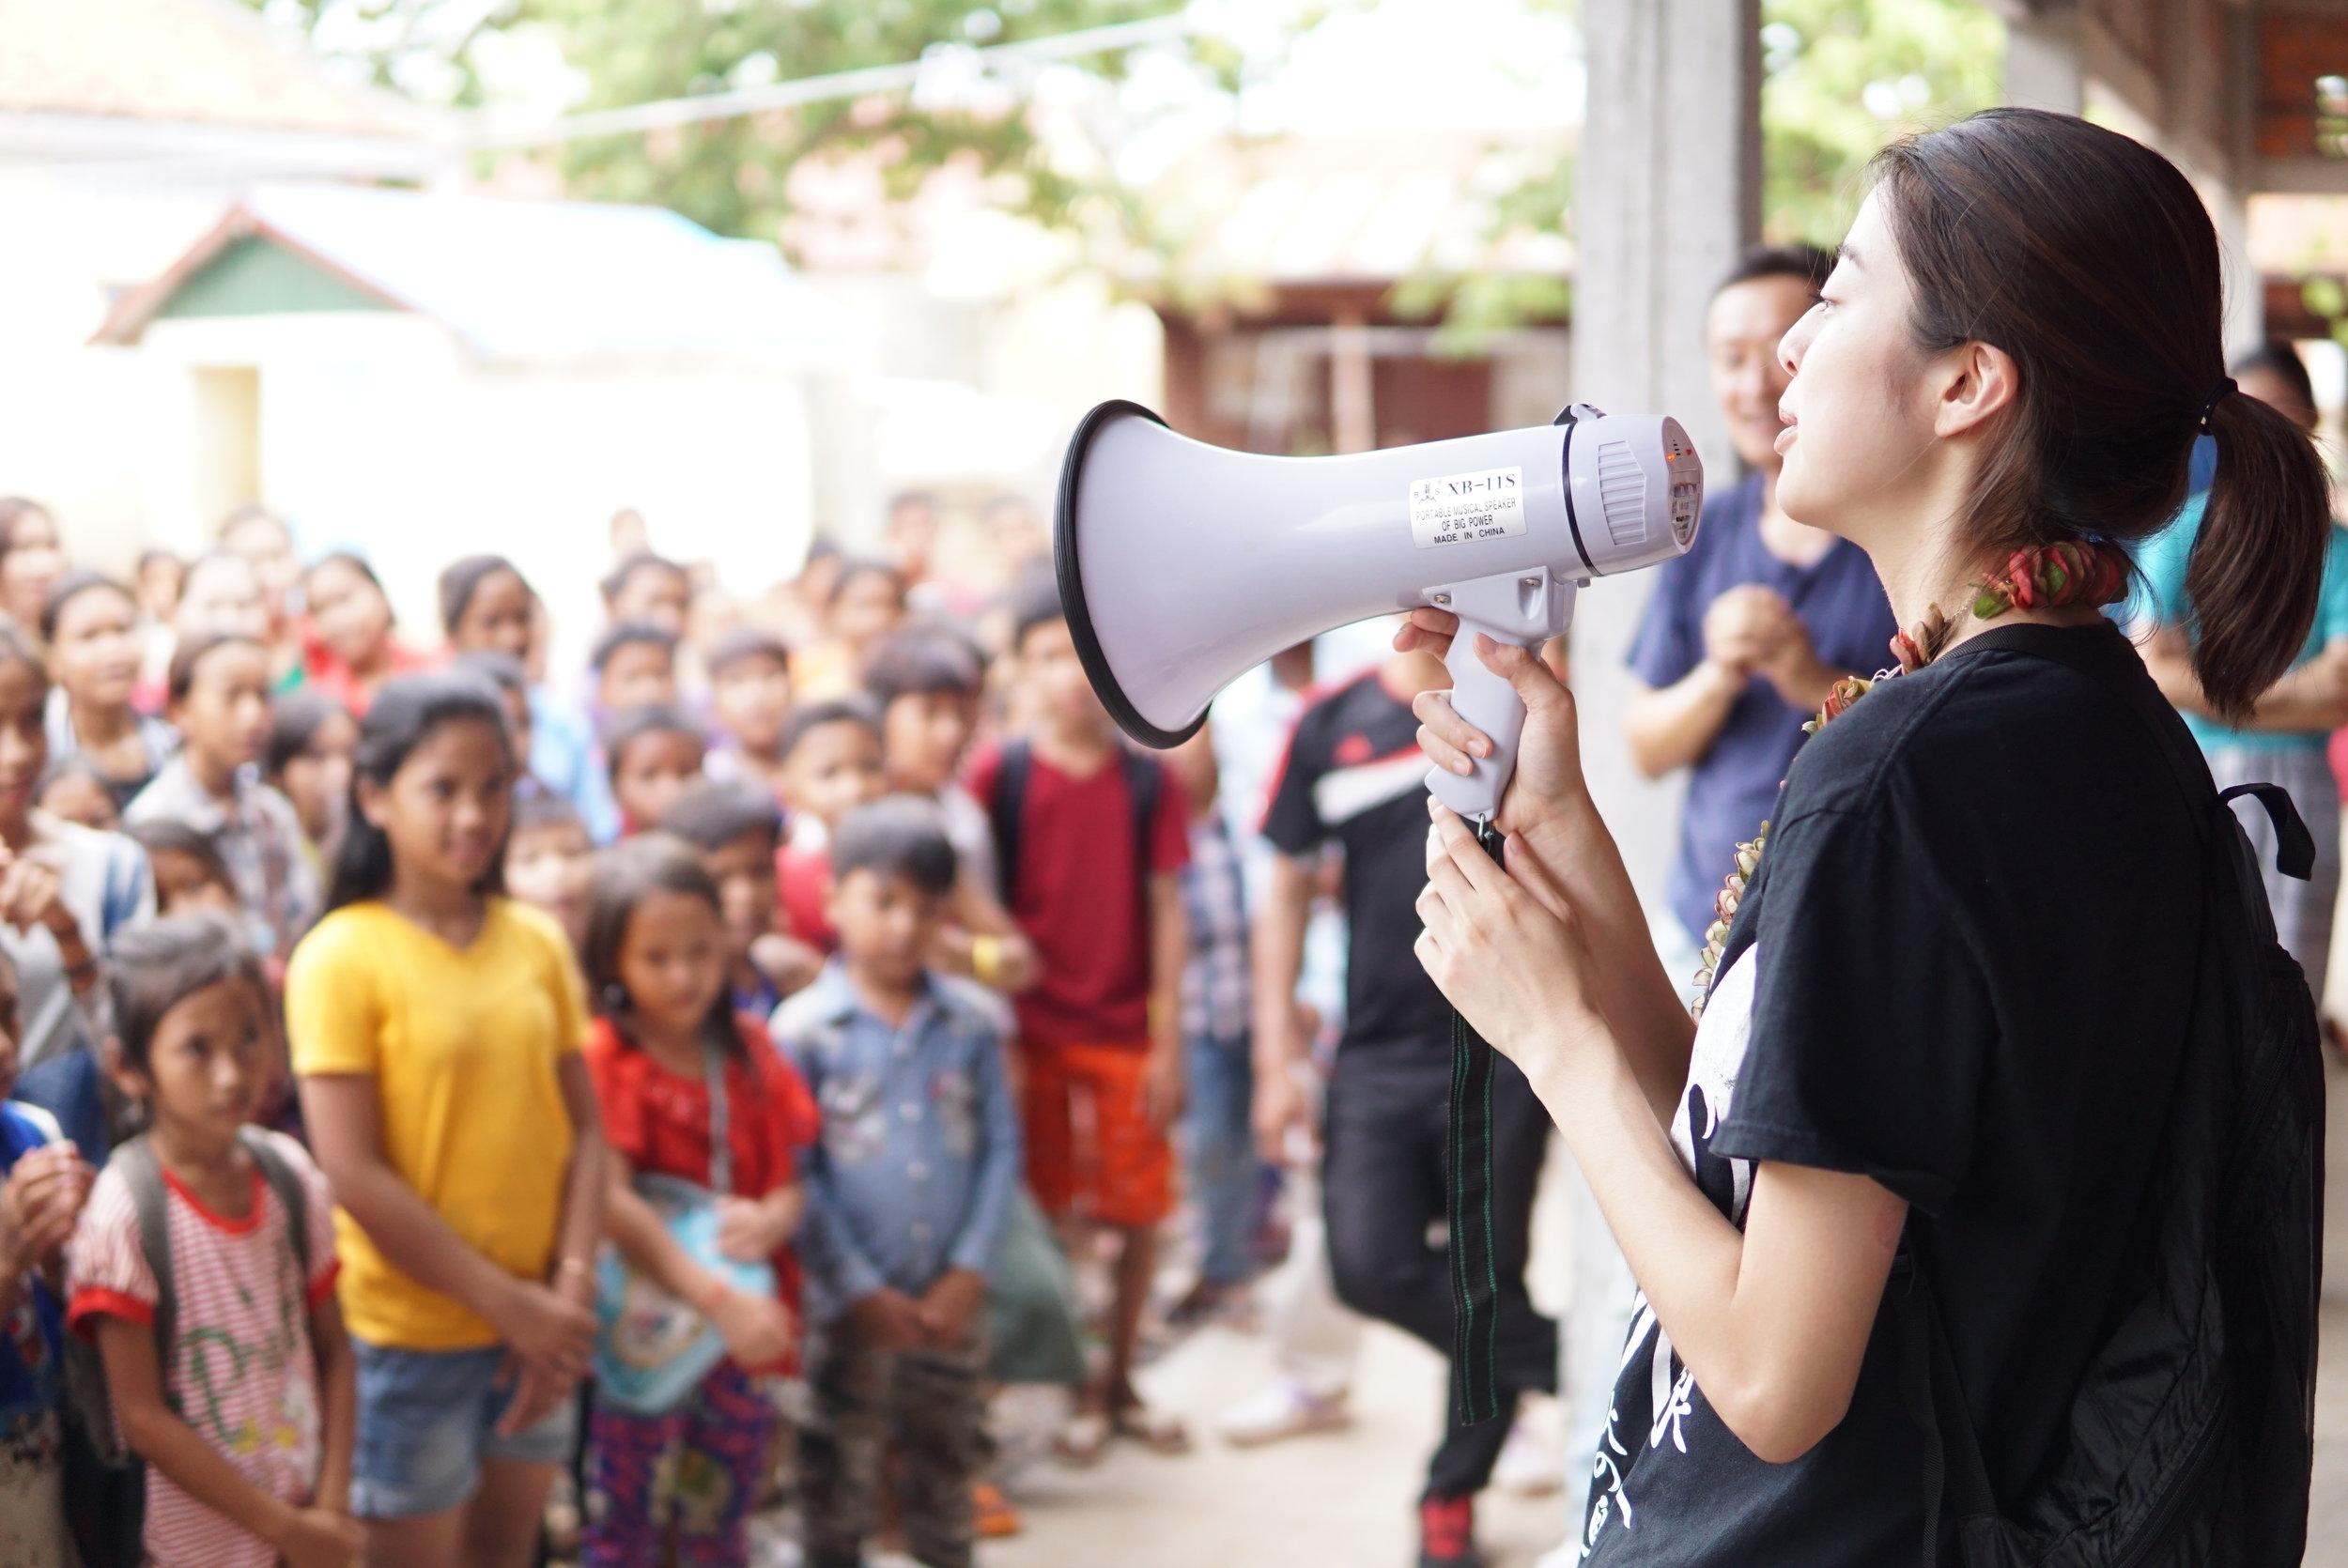 Miyu introducing herself before the students of the Samrang TASSEL School, 2016.